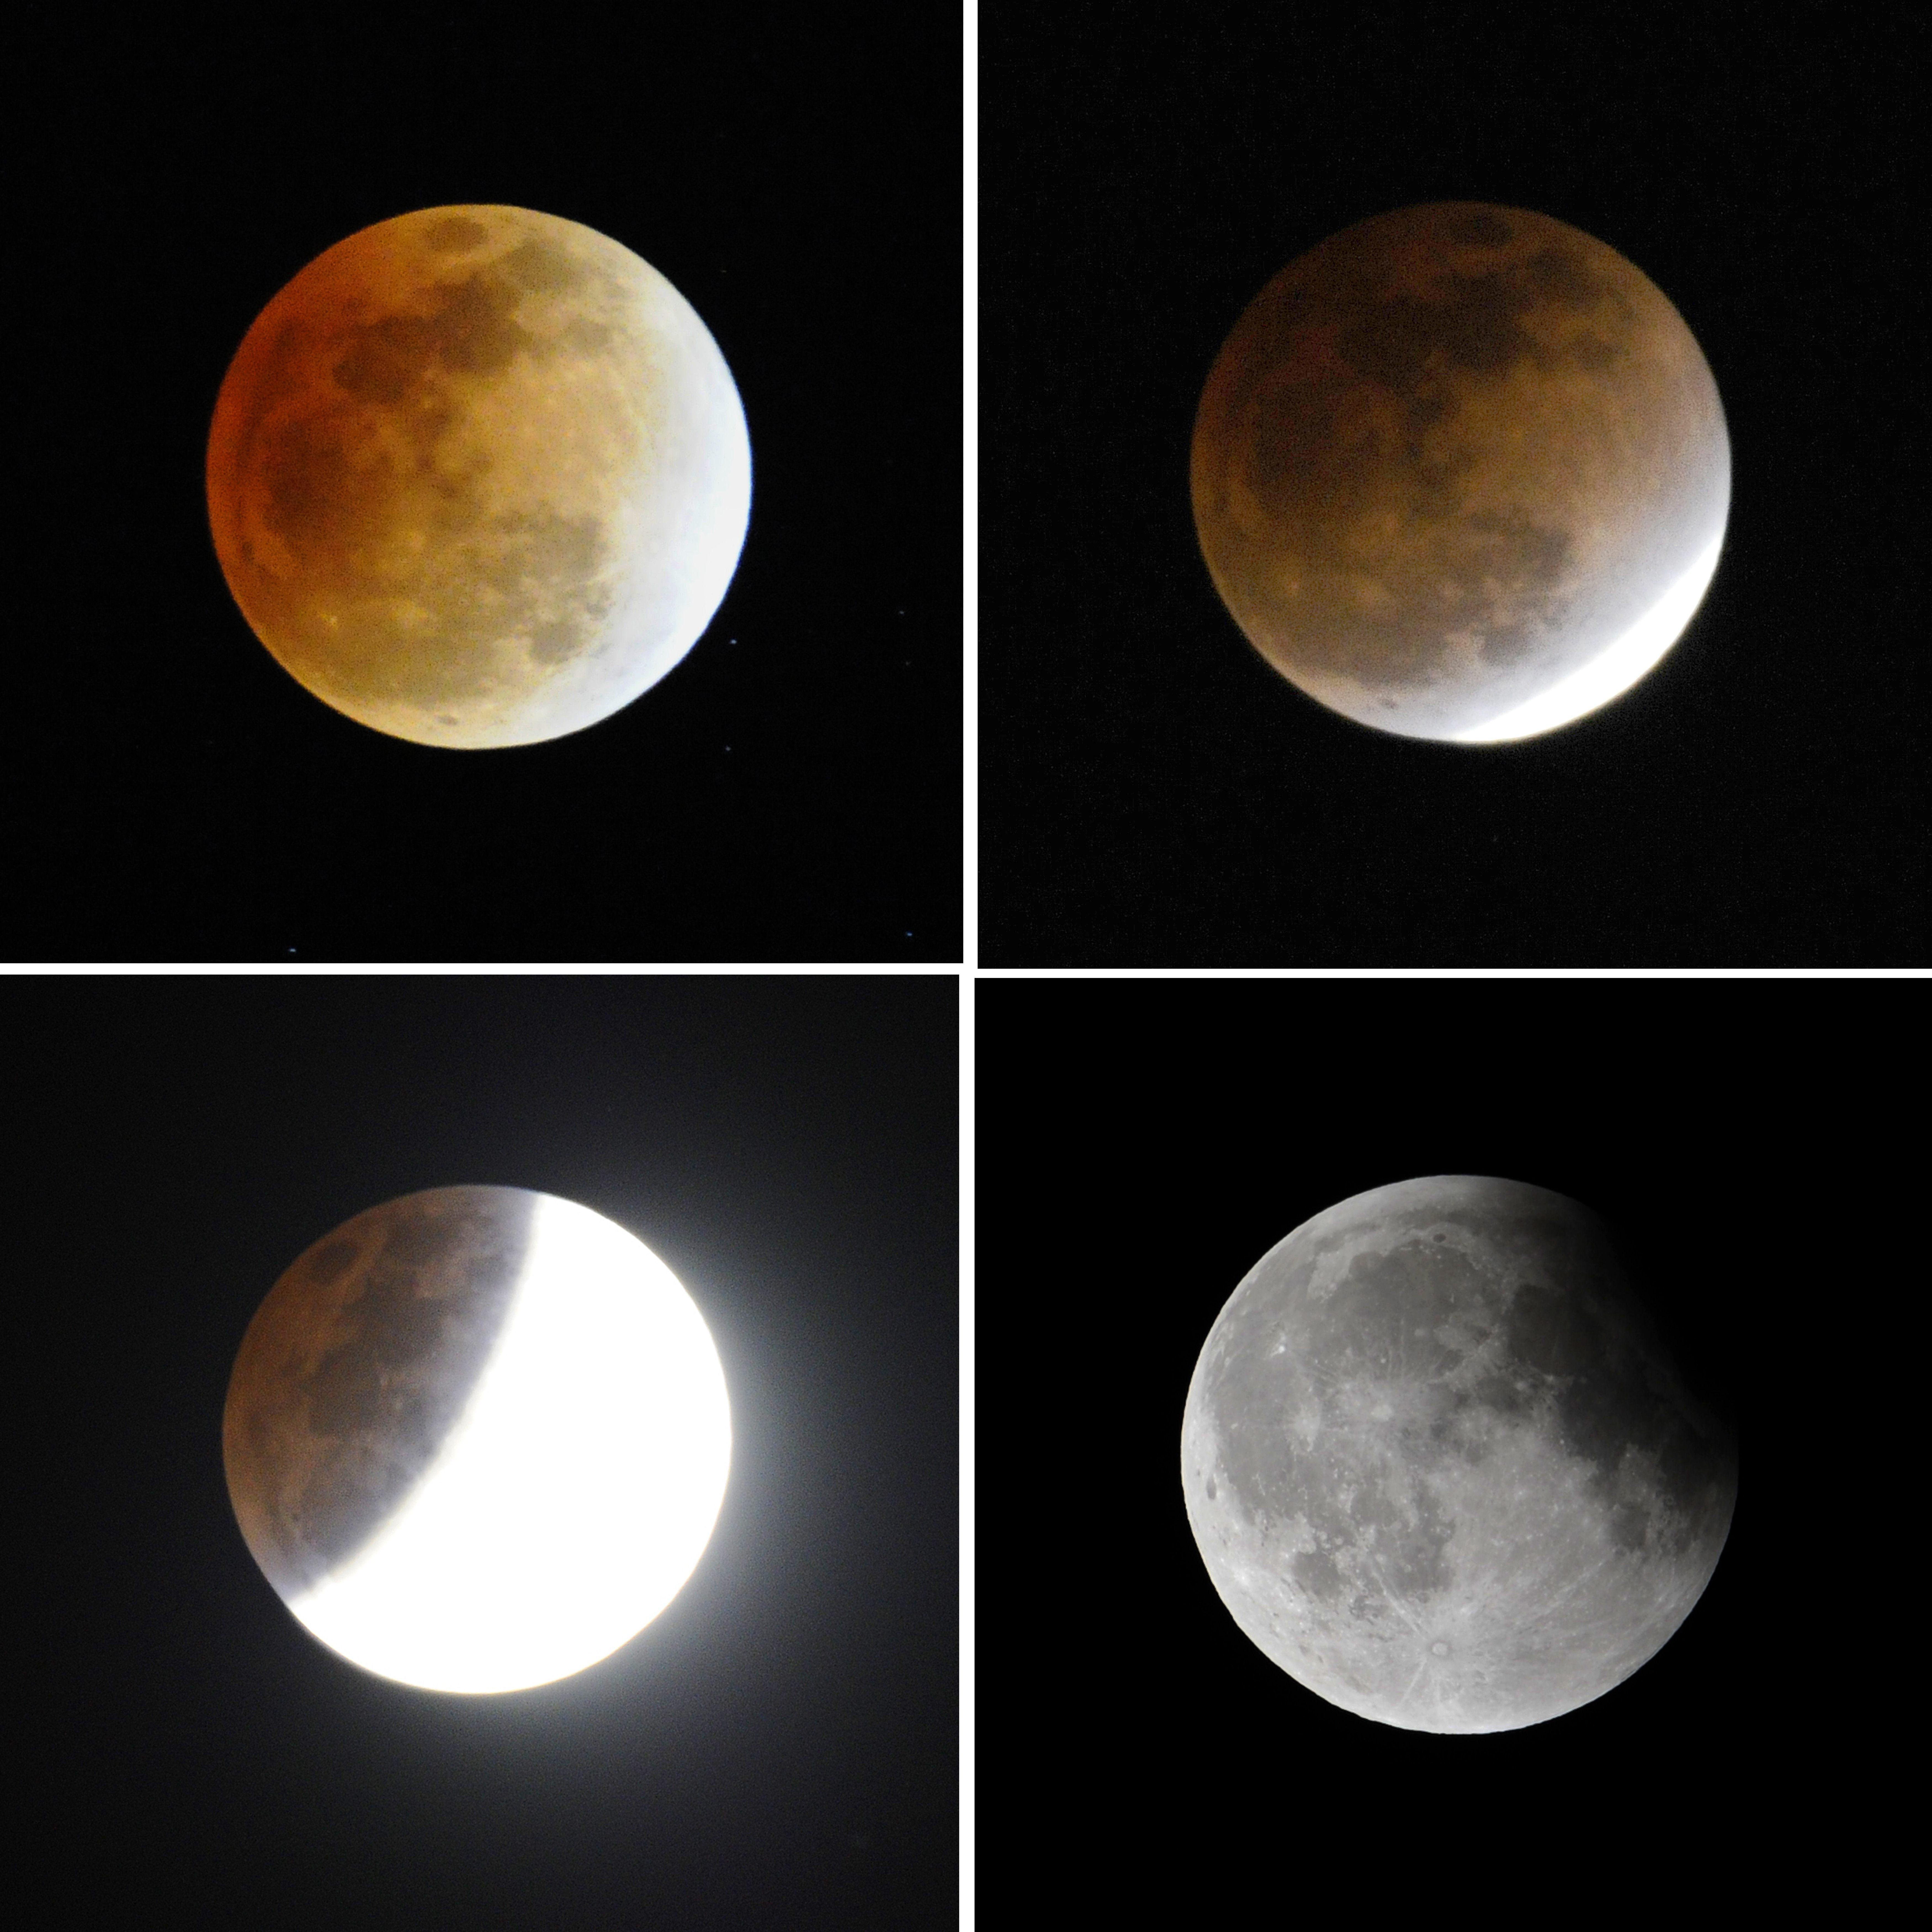 lunar eclipse april 2013 popsugar tech rh popsugar com Annular Solar Eclipse Solar and Lunar Eclipse